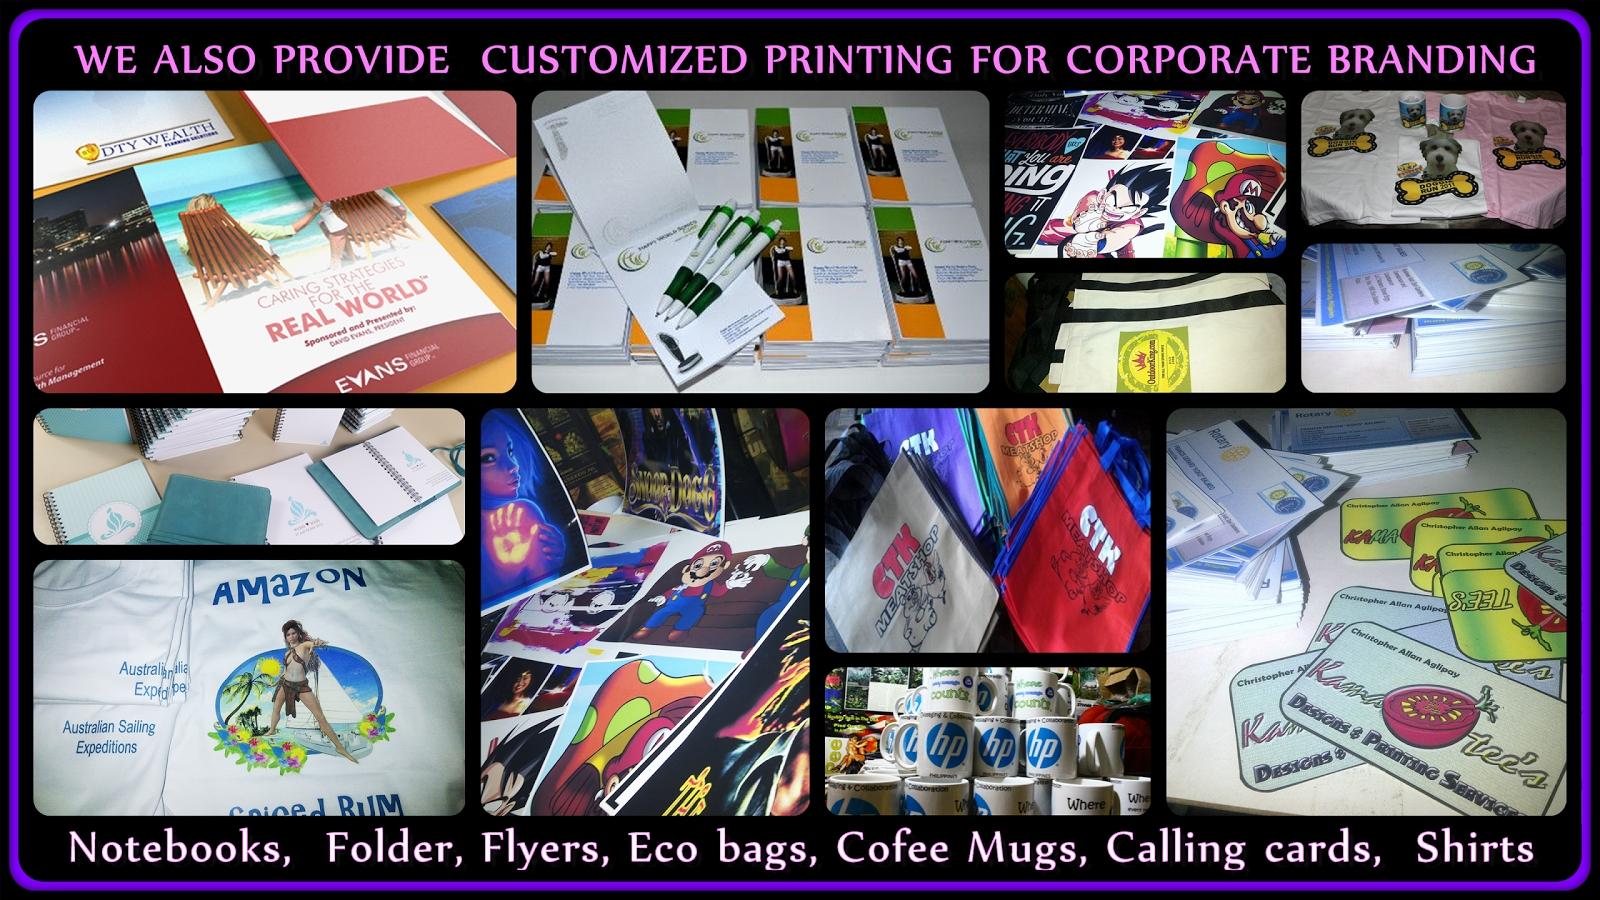 Digital Tshirt Printing Quezon City - Dreamworks Calendar Printing In Quezon City